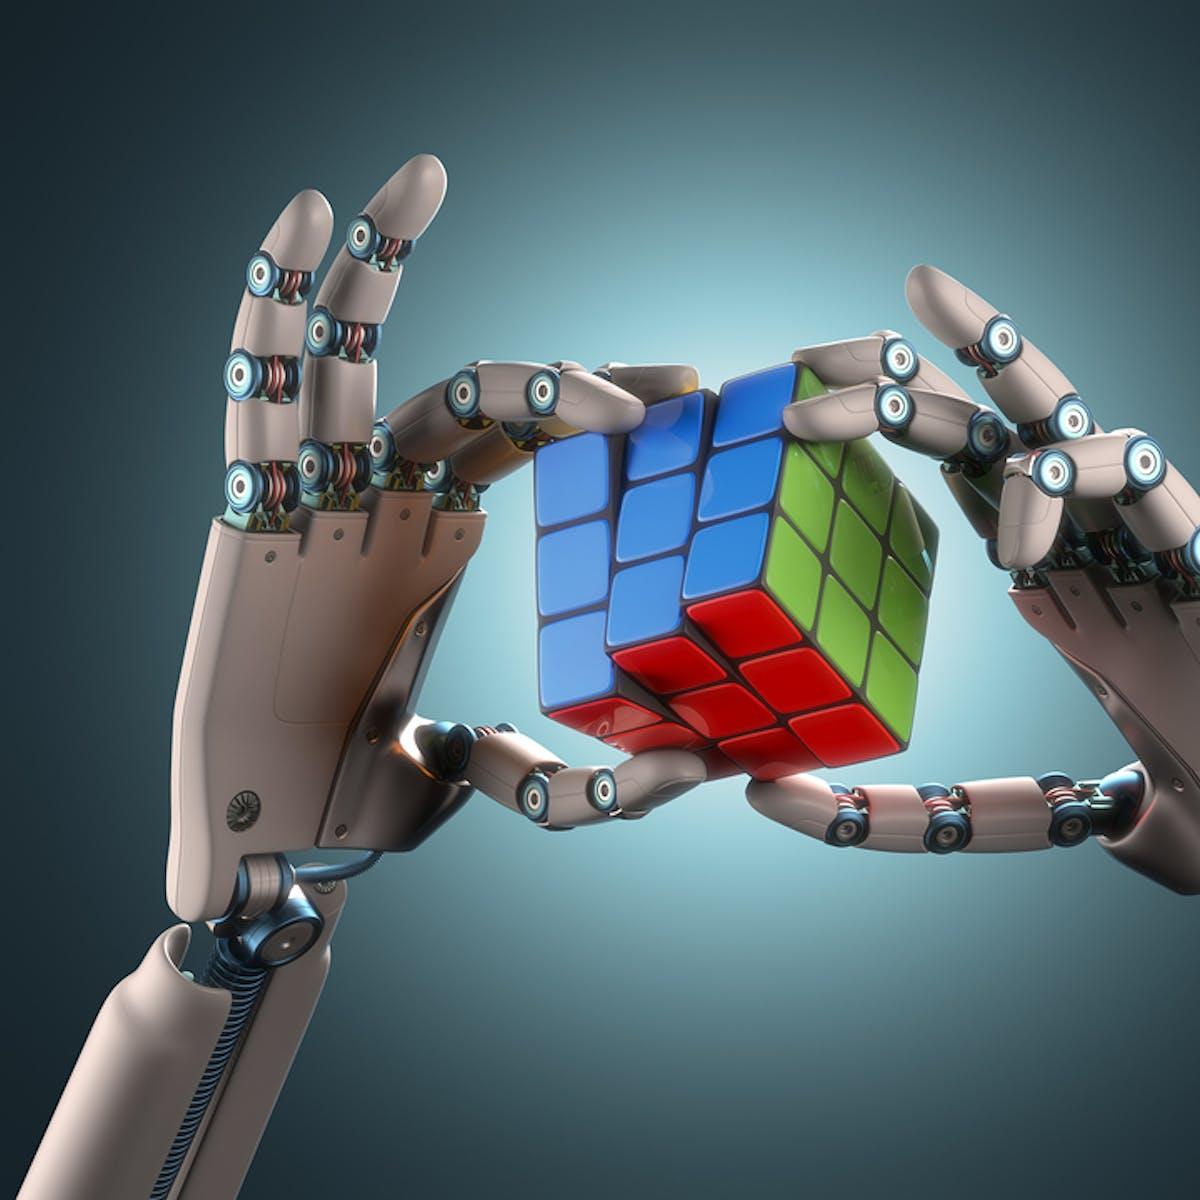 Robotic Hands Are One of the Big Challenges Facing Robotics